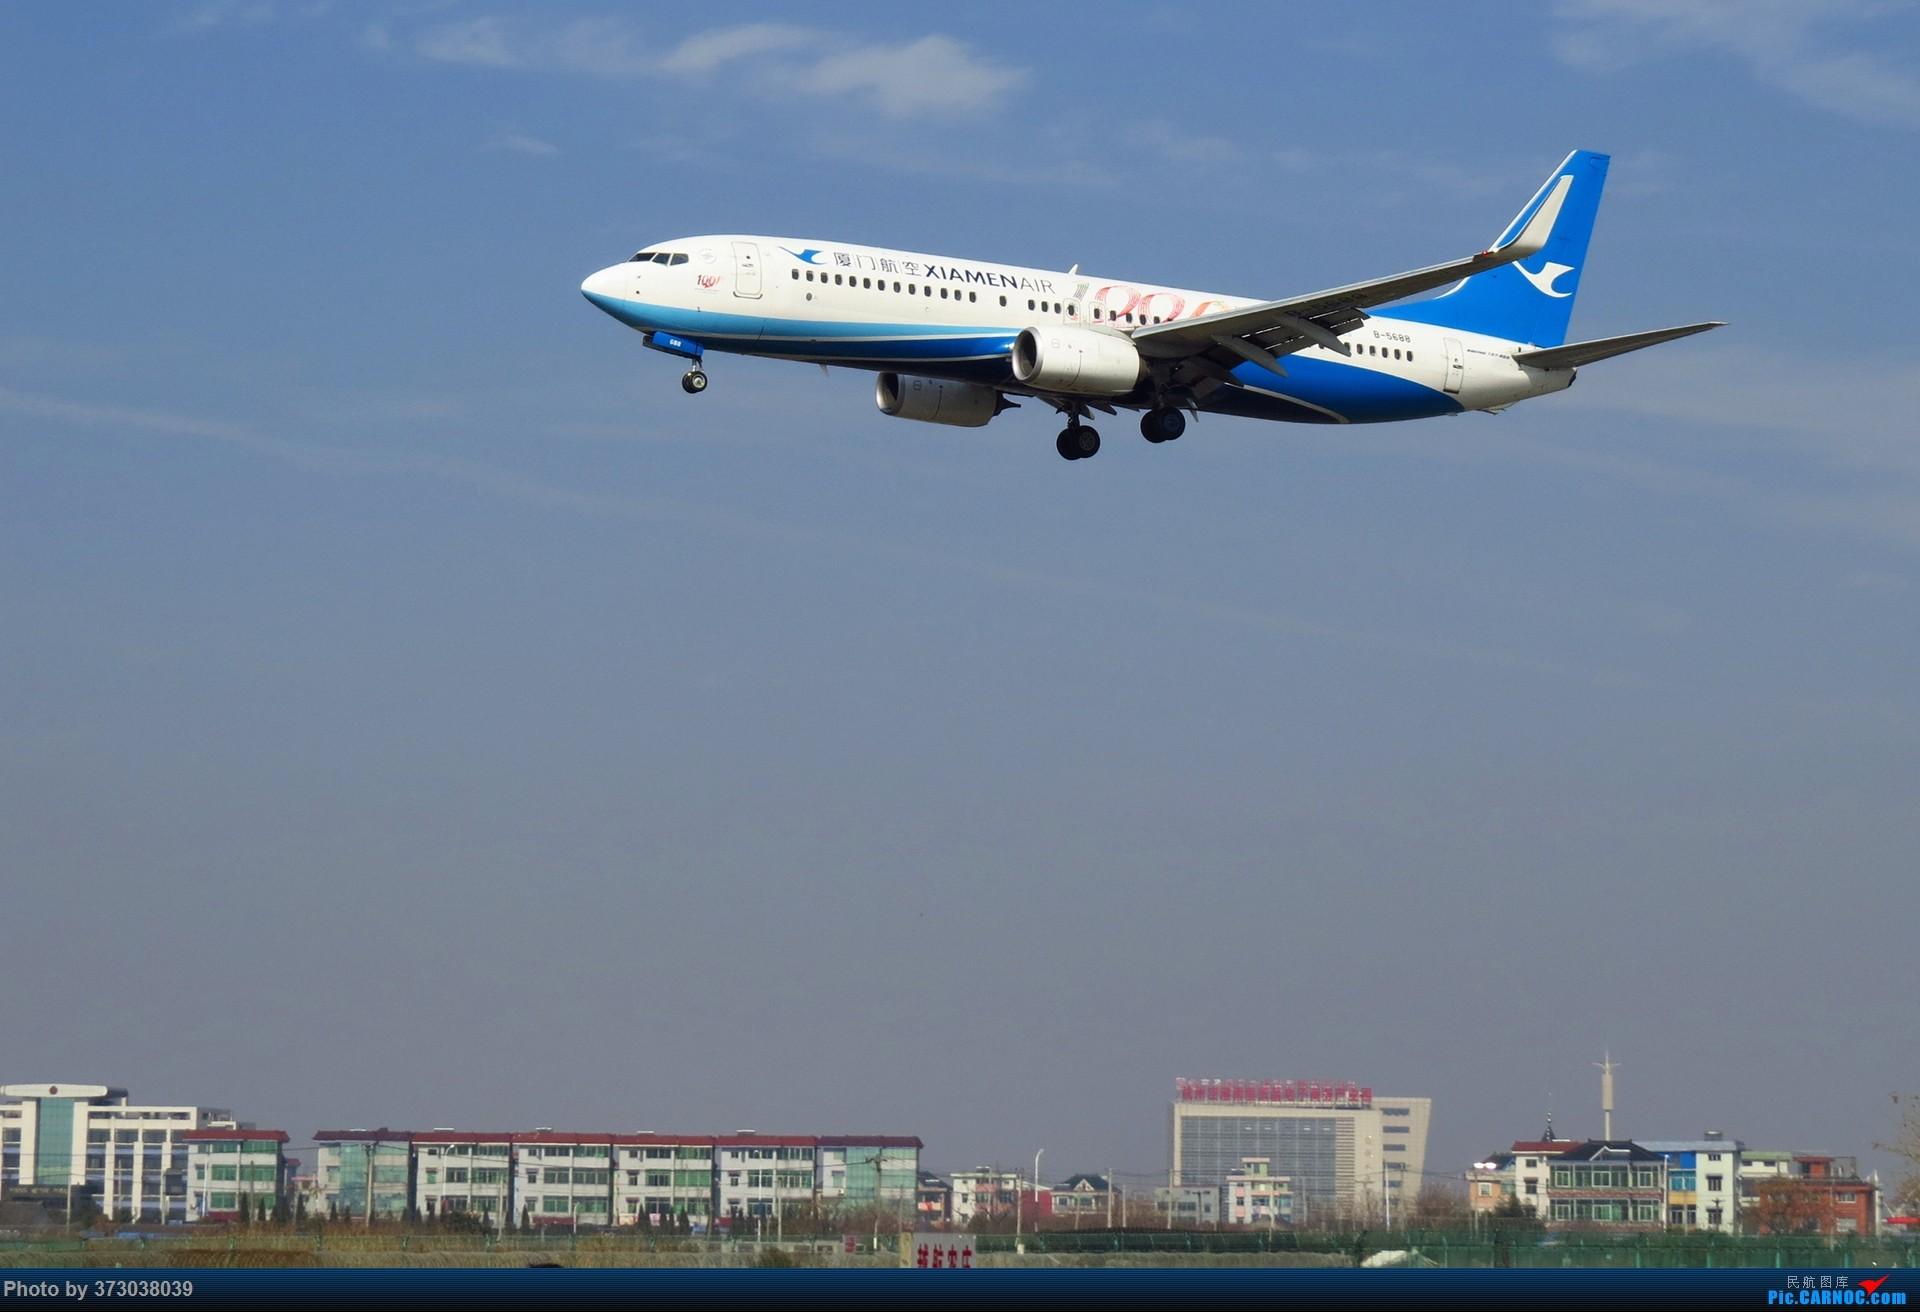 Re:[原创]【杭州飞友会 】50周年,烂大街的波音737 杭州飞友接力照 BOEING 737-800 B-5688 中国杭州萧山国际机场